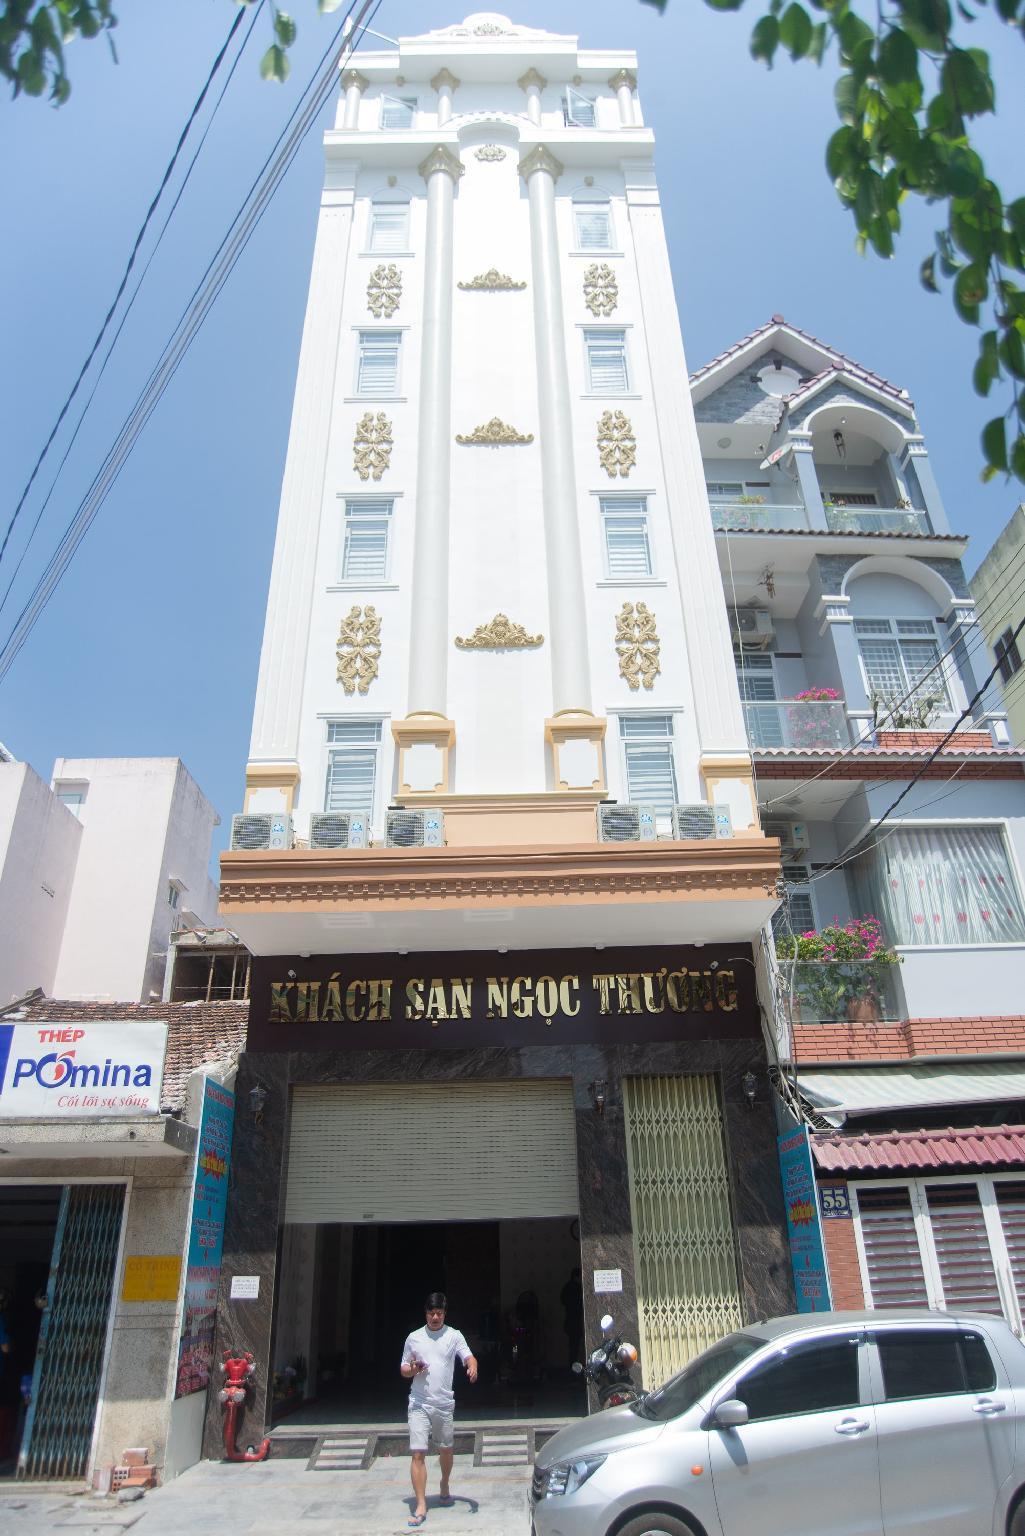 Khach San Ngoc Thuong